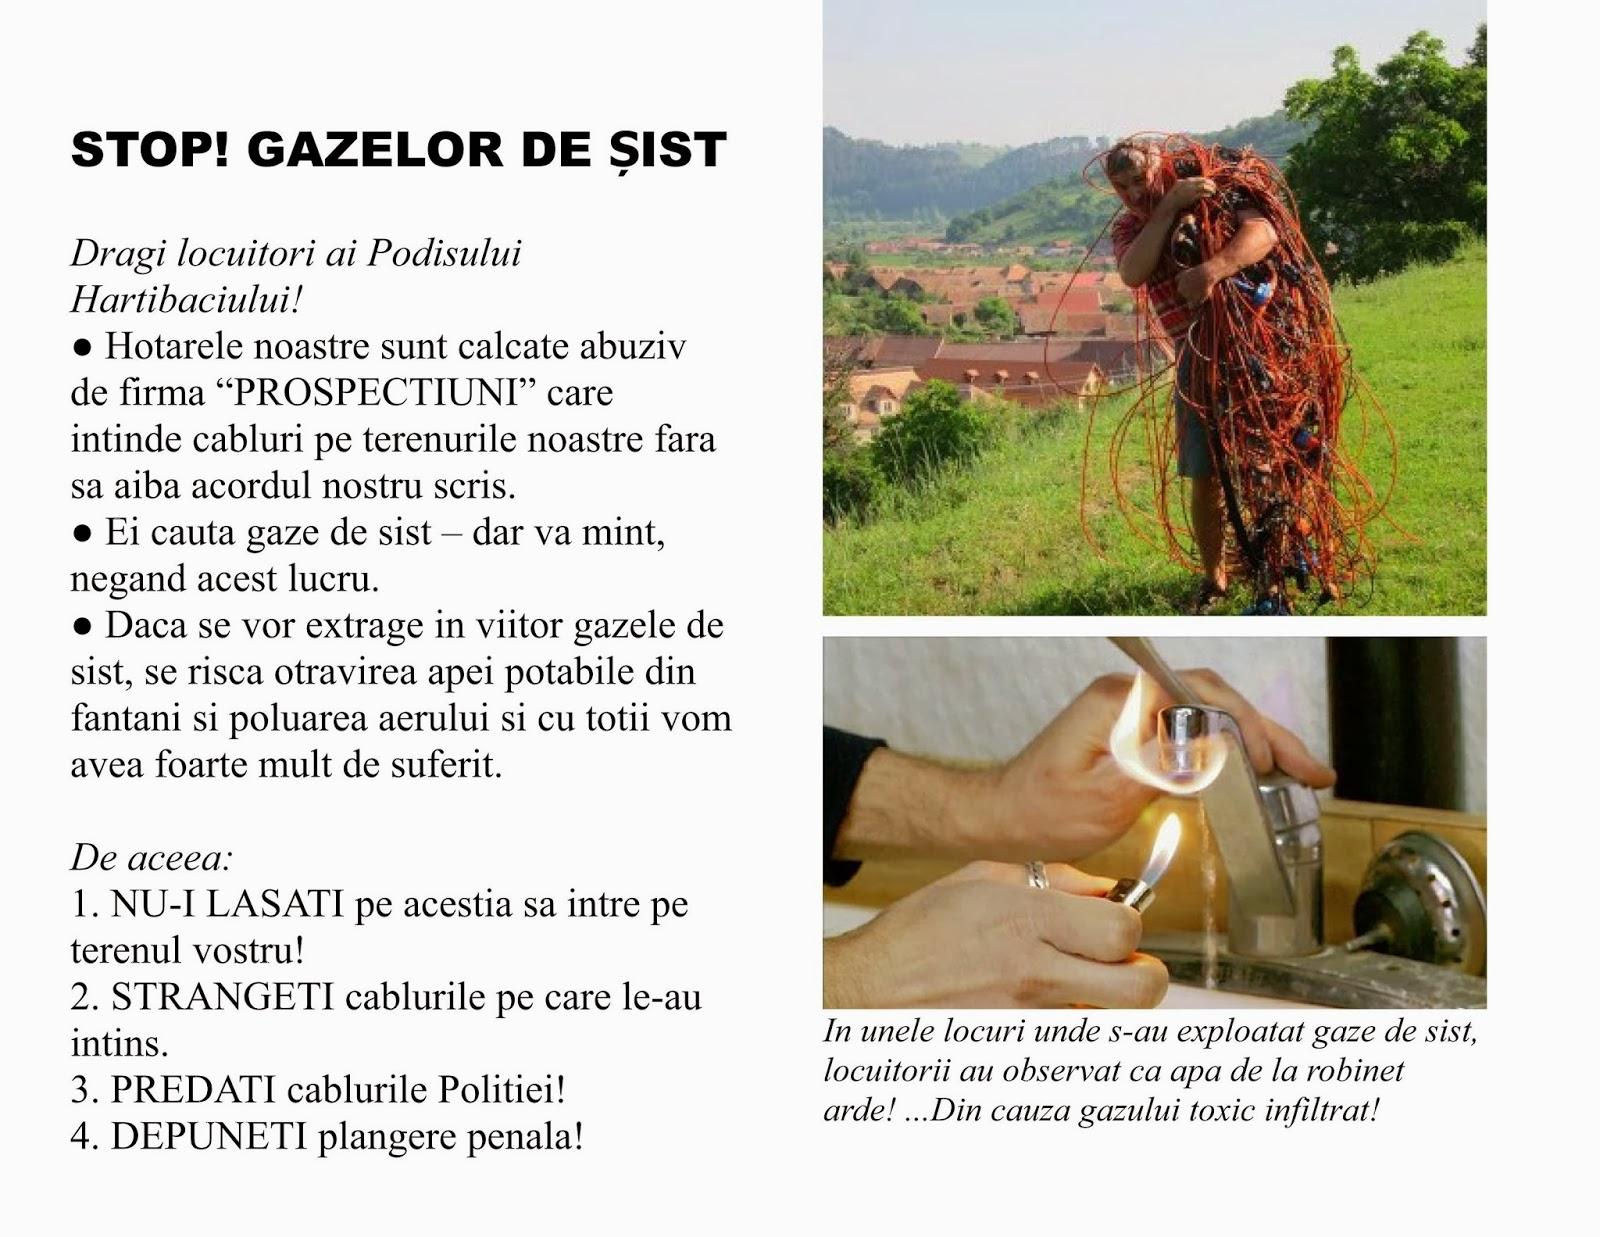 http://www.cotaru.com/wp-content/uploads/2013/11/flyerGDS-Hartibaciu_201311.pdf